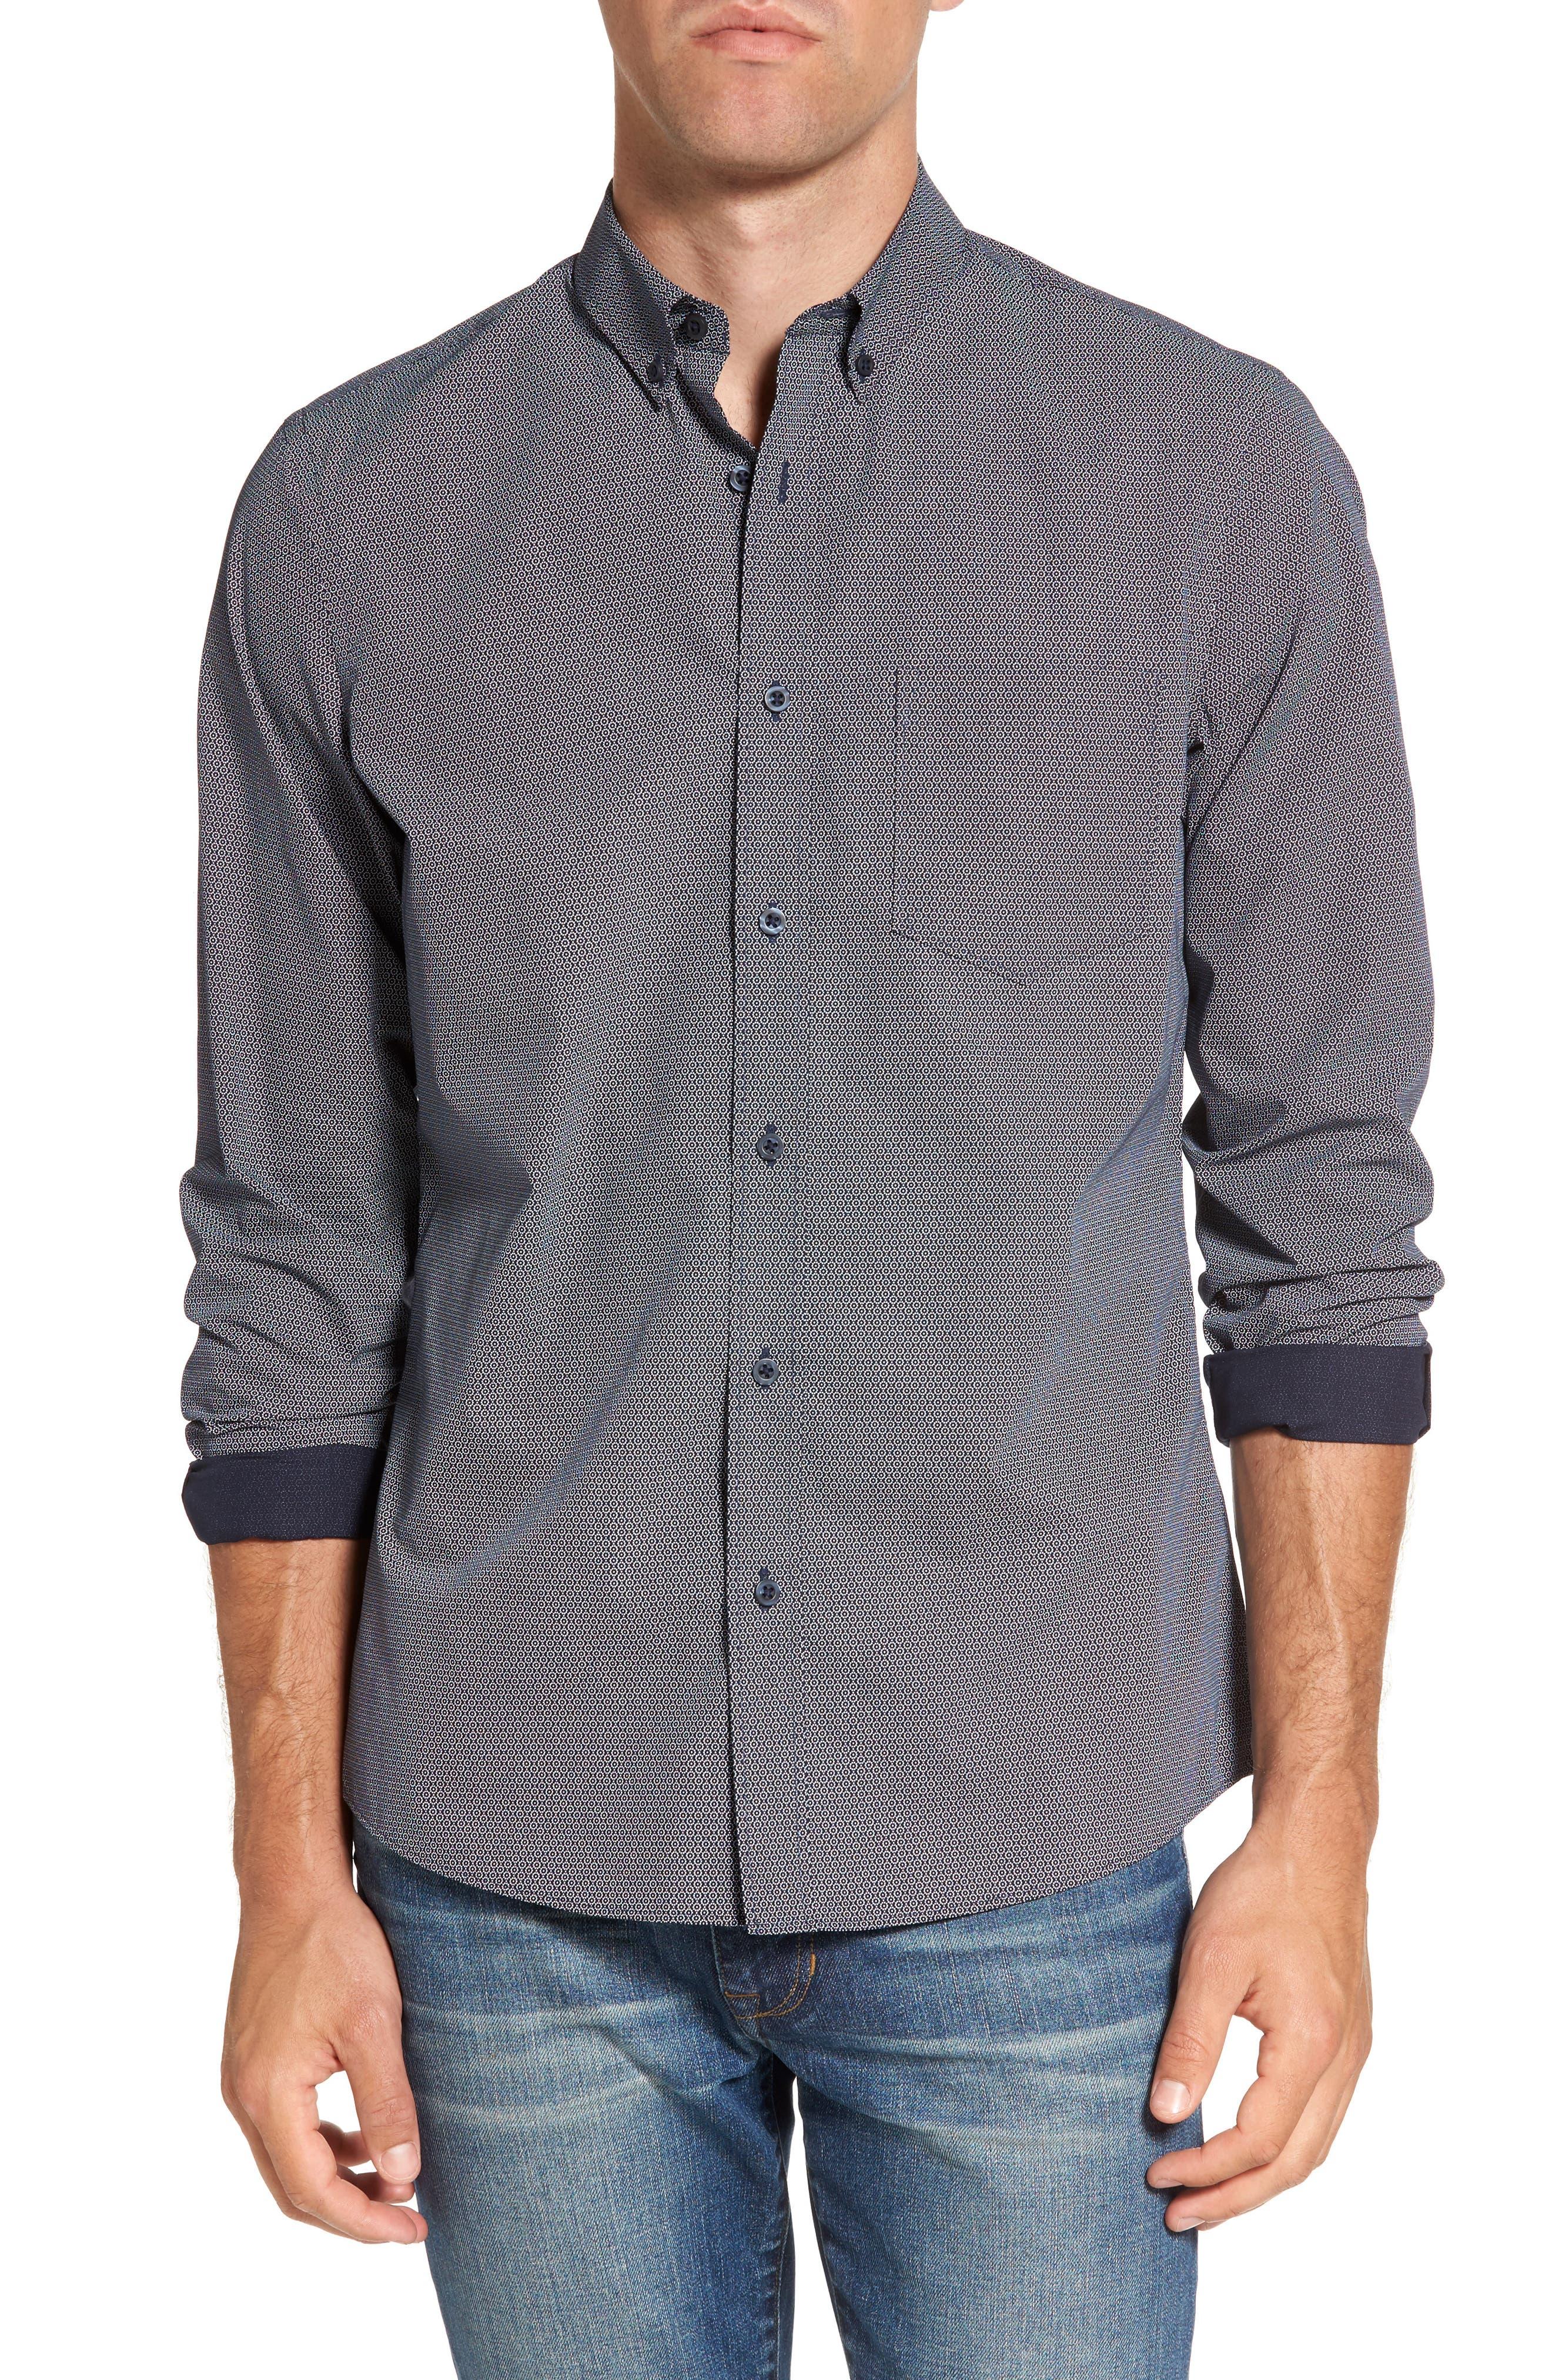 Alternate Image 1 Selected - Nordstrom Men's Shop Slim Fit Non-Iron Dot Print Sport Shirt